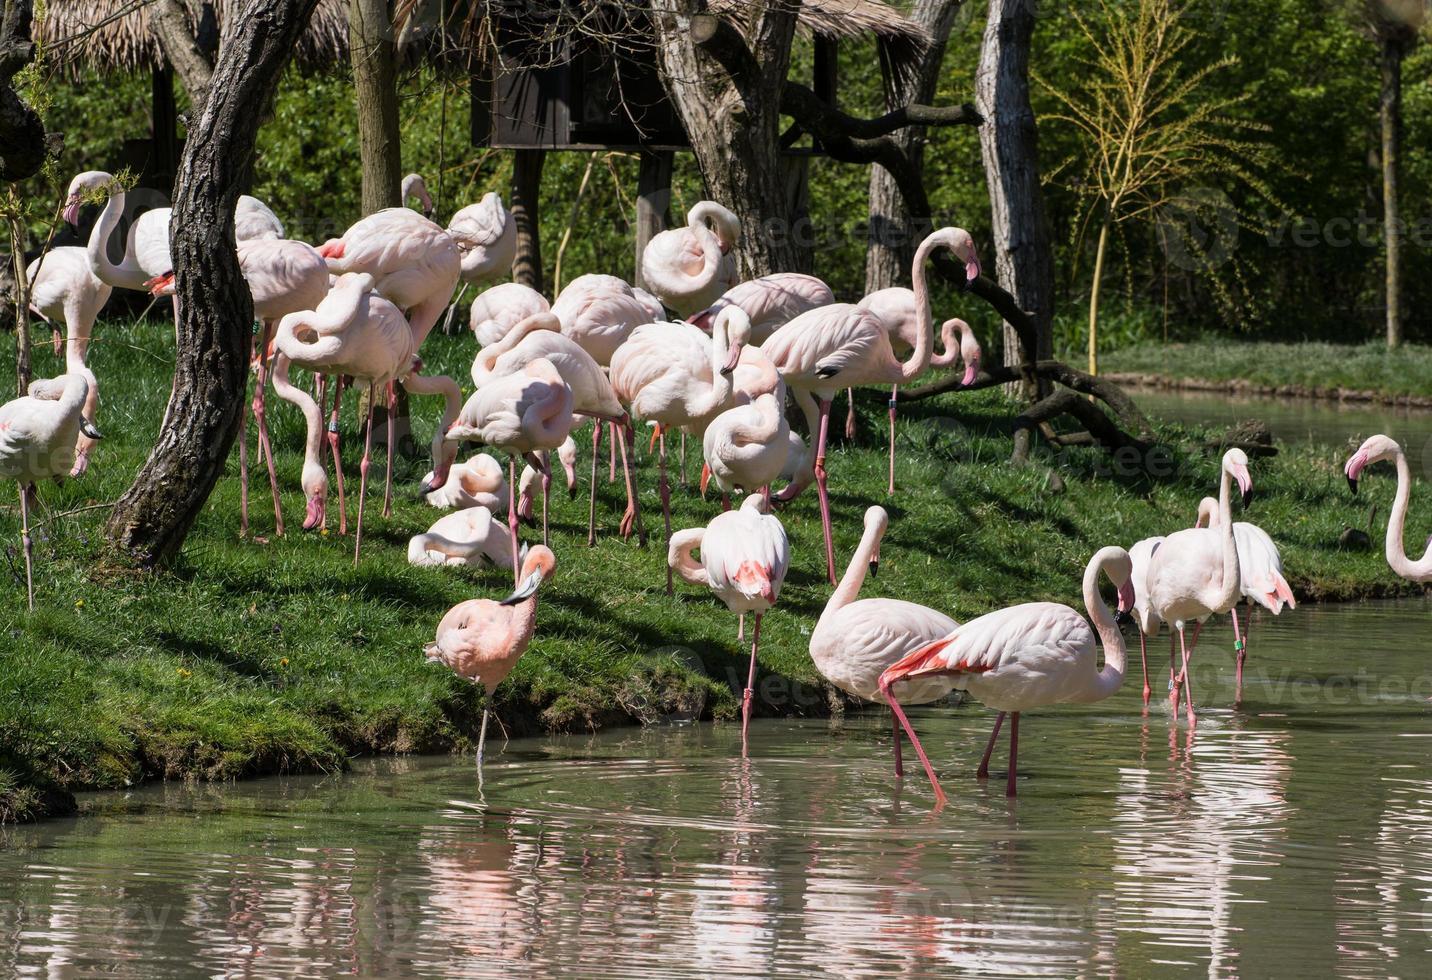 groep grotere flamingo's (phoenicopterus ruber roseus) foto